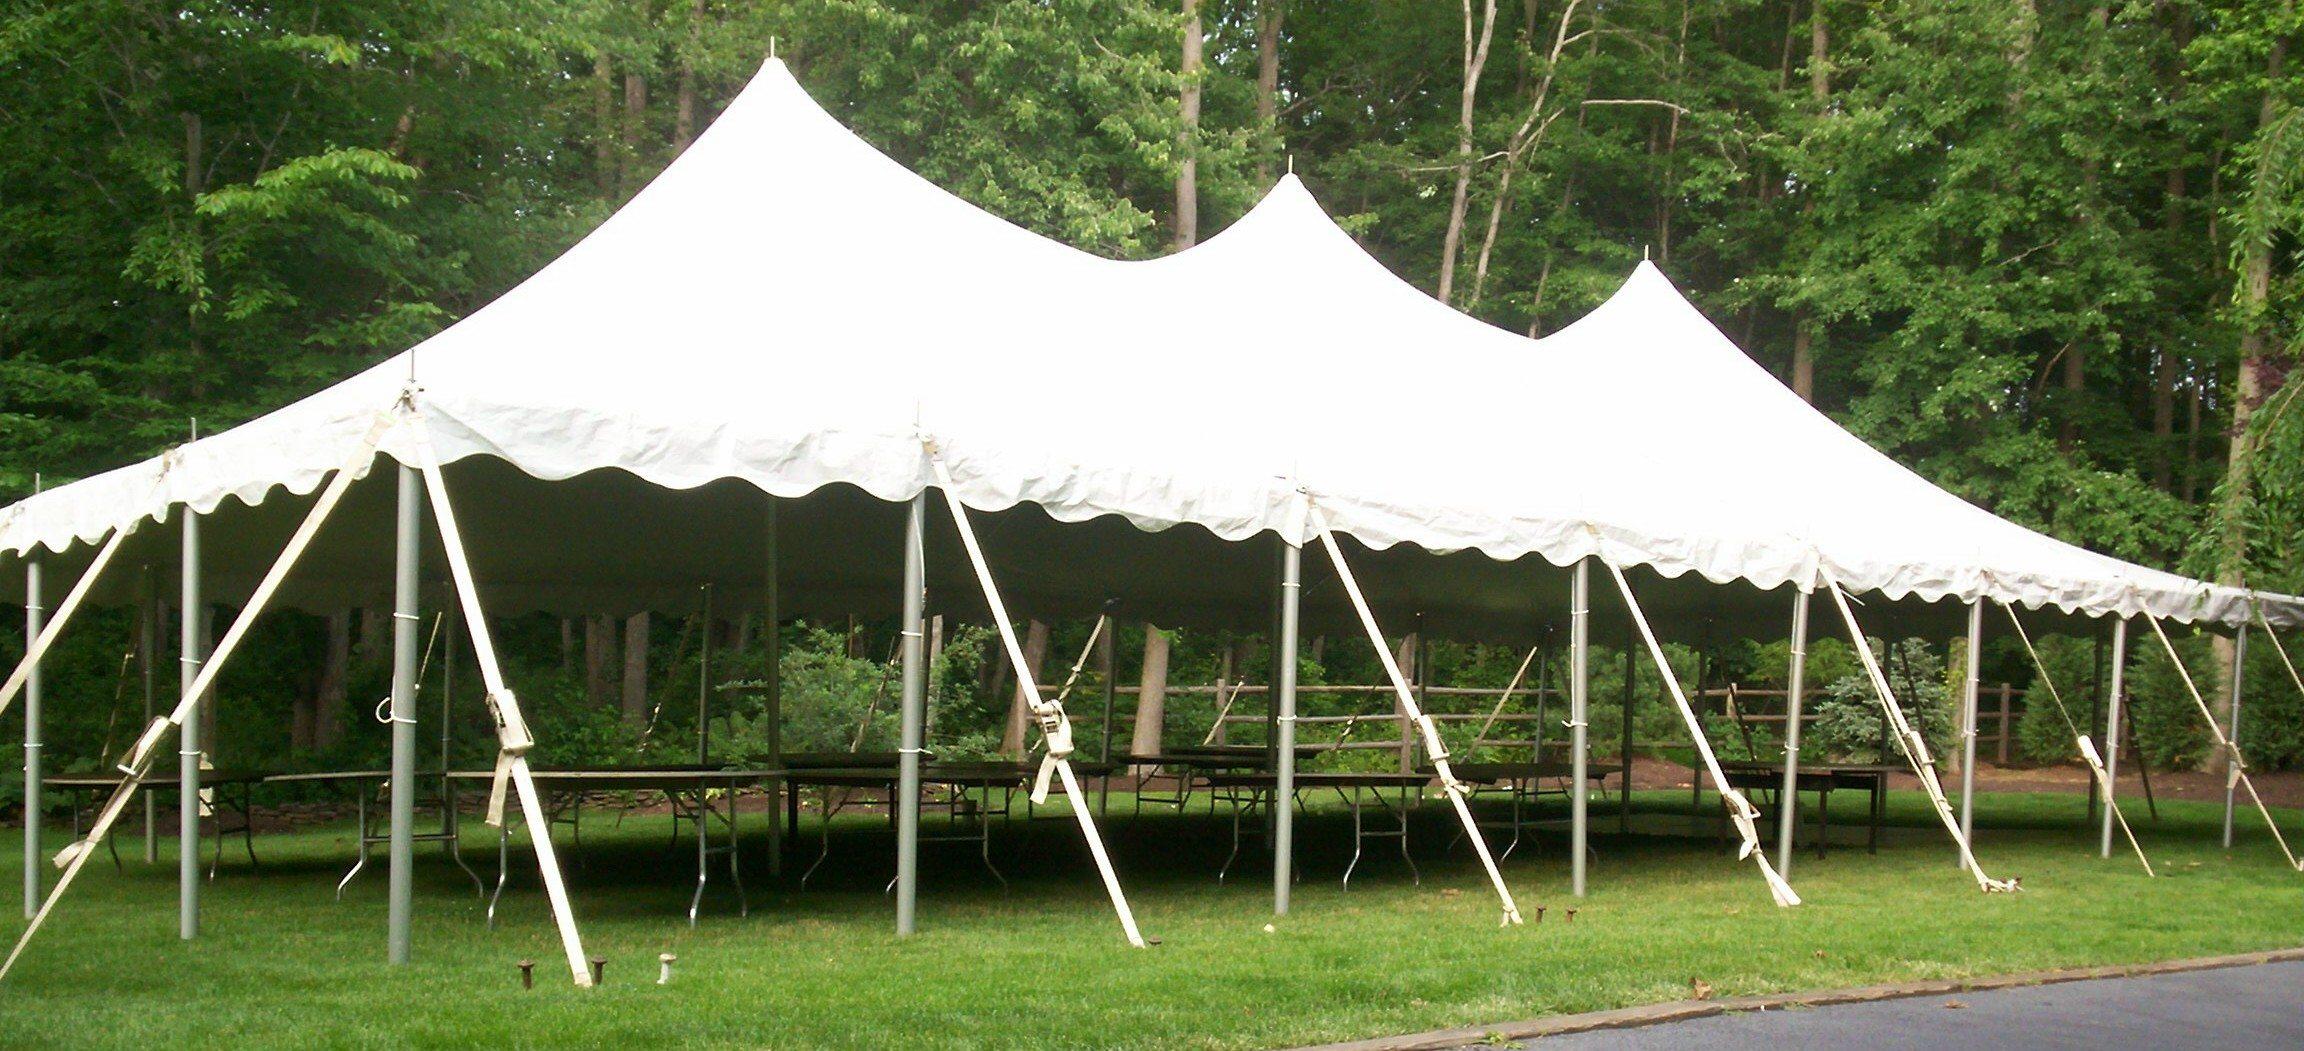 Category 30u0027 Wide Pole Tent. & Ocean Tents-30u0027 X 60u0027 1800 sq. ft.